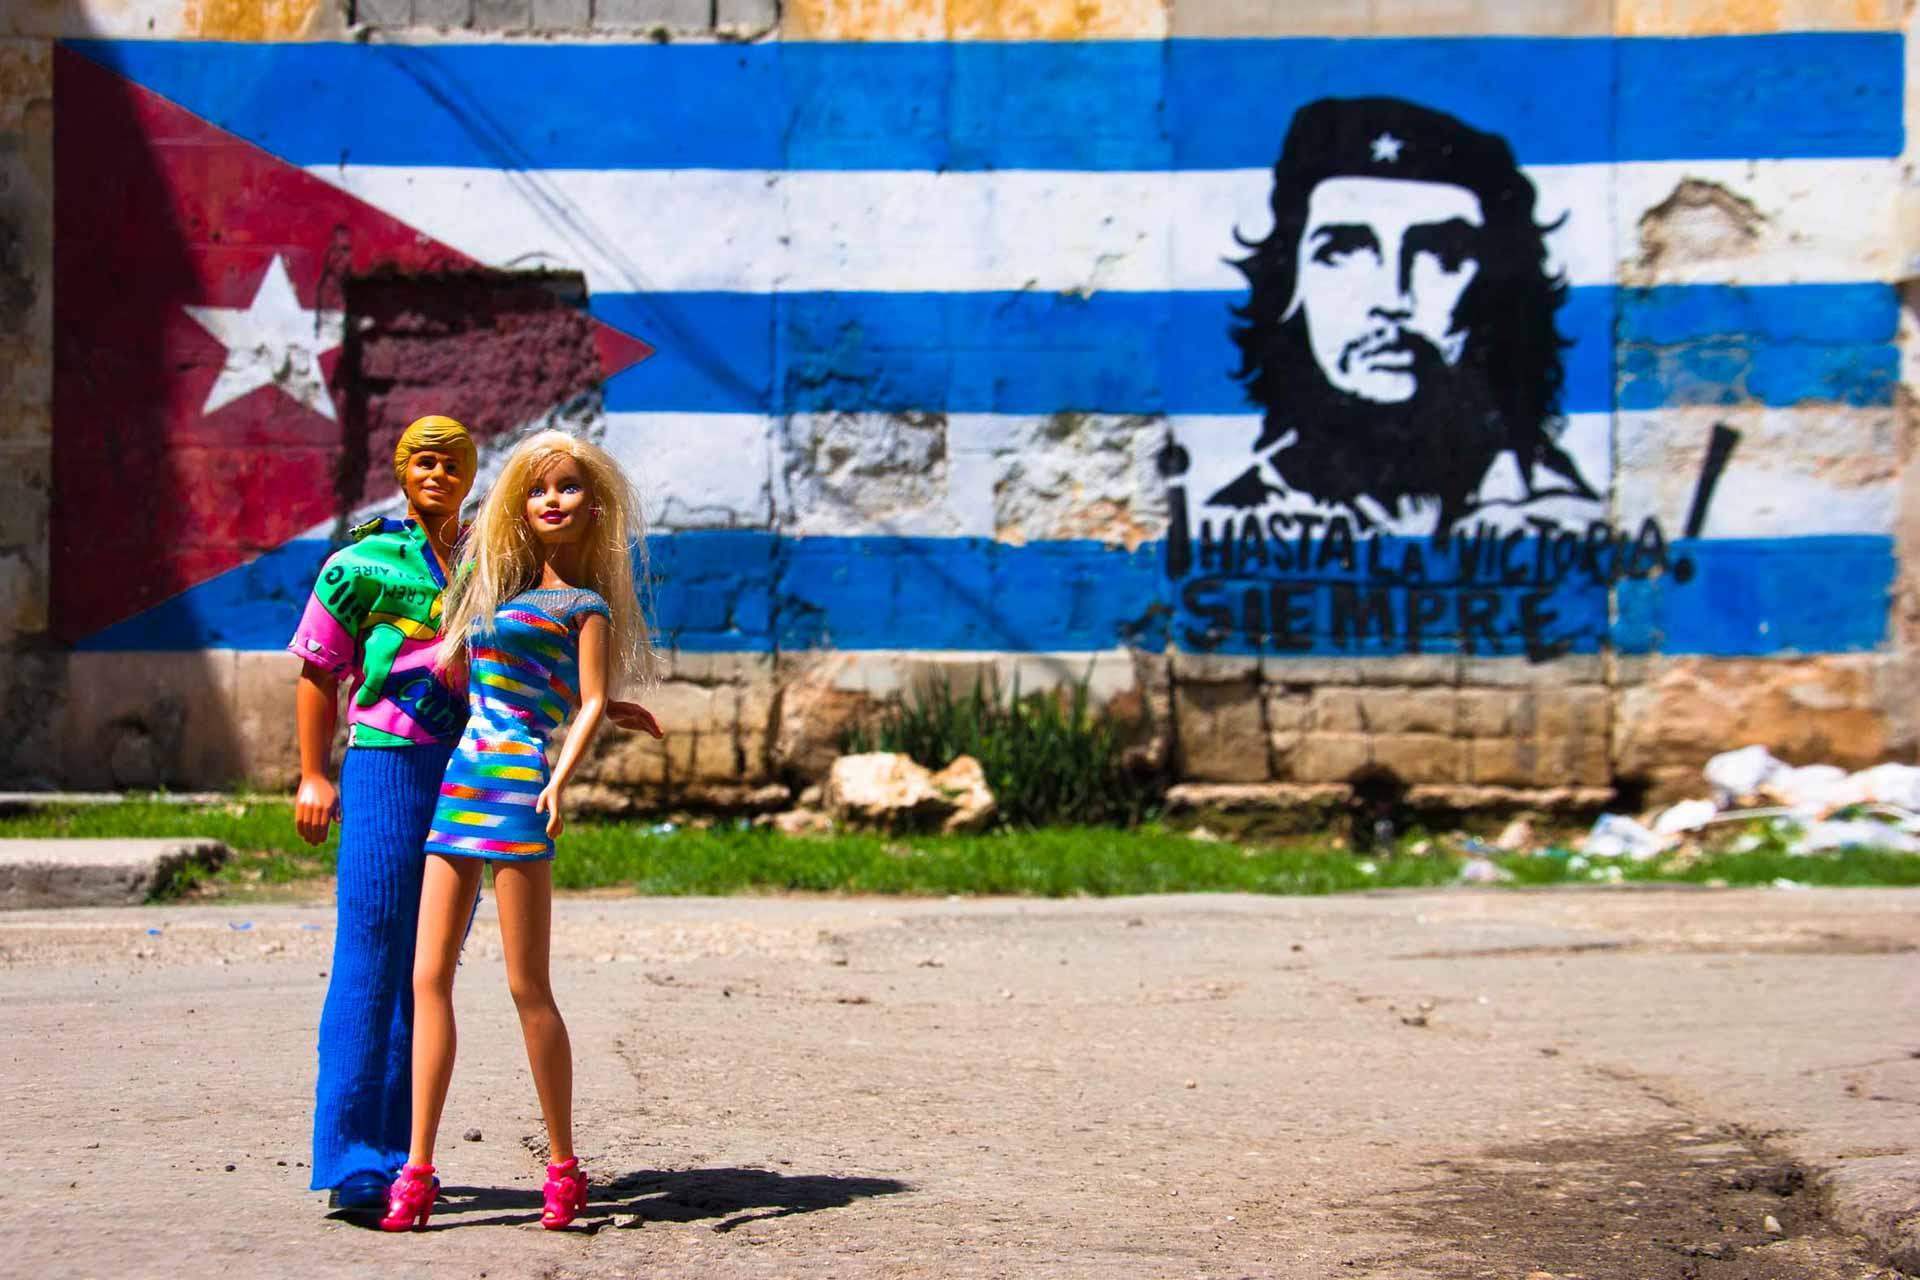 Barbie Around the World Che Guevara Selfie, havana, cuba, pescart, photo blog, travel blog, blog, photo travel blog, enrico pescantini, pescantini